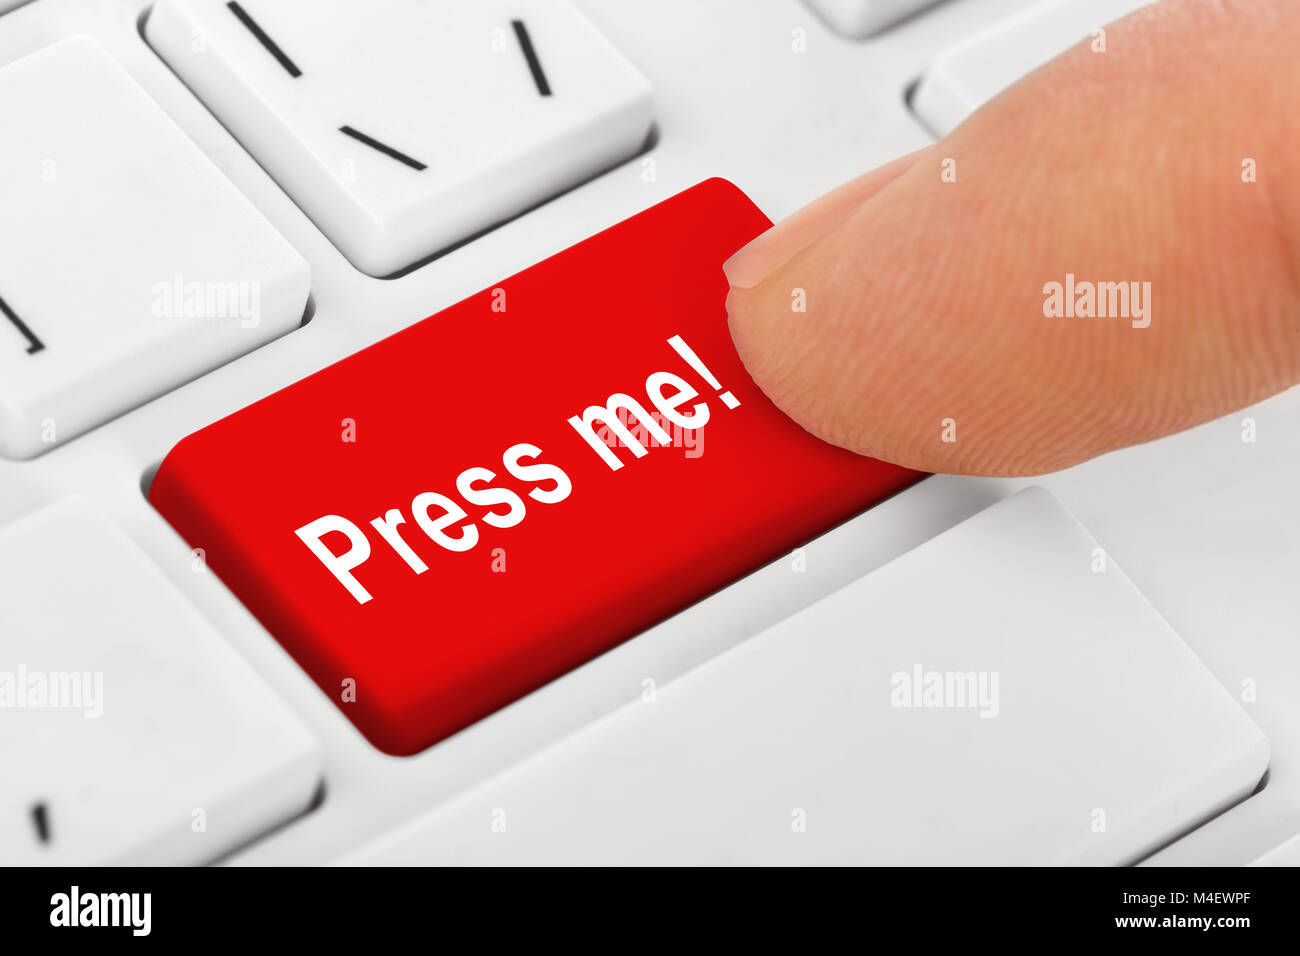 Keyboard Key Press Stock Photos & Keyboard Key Press Stock